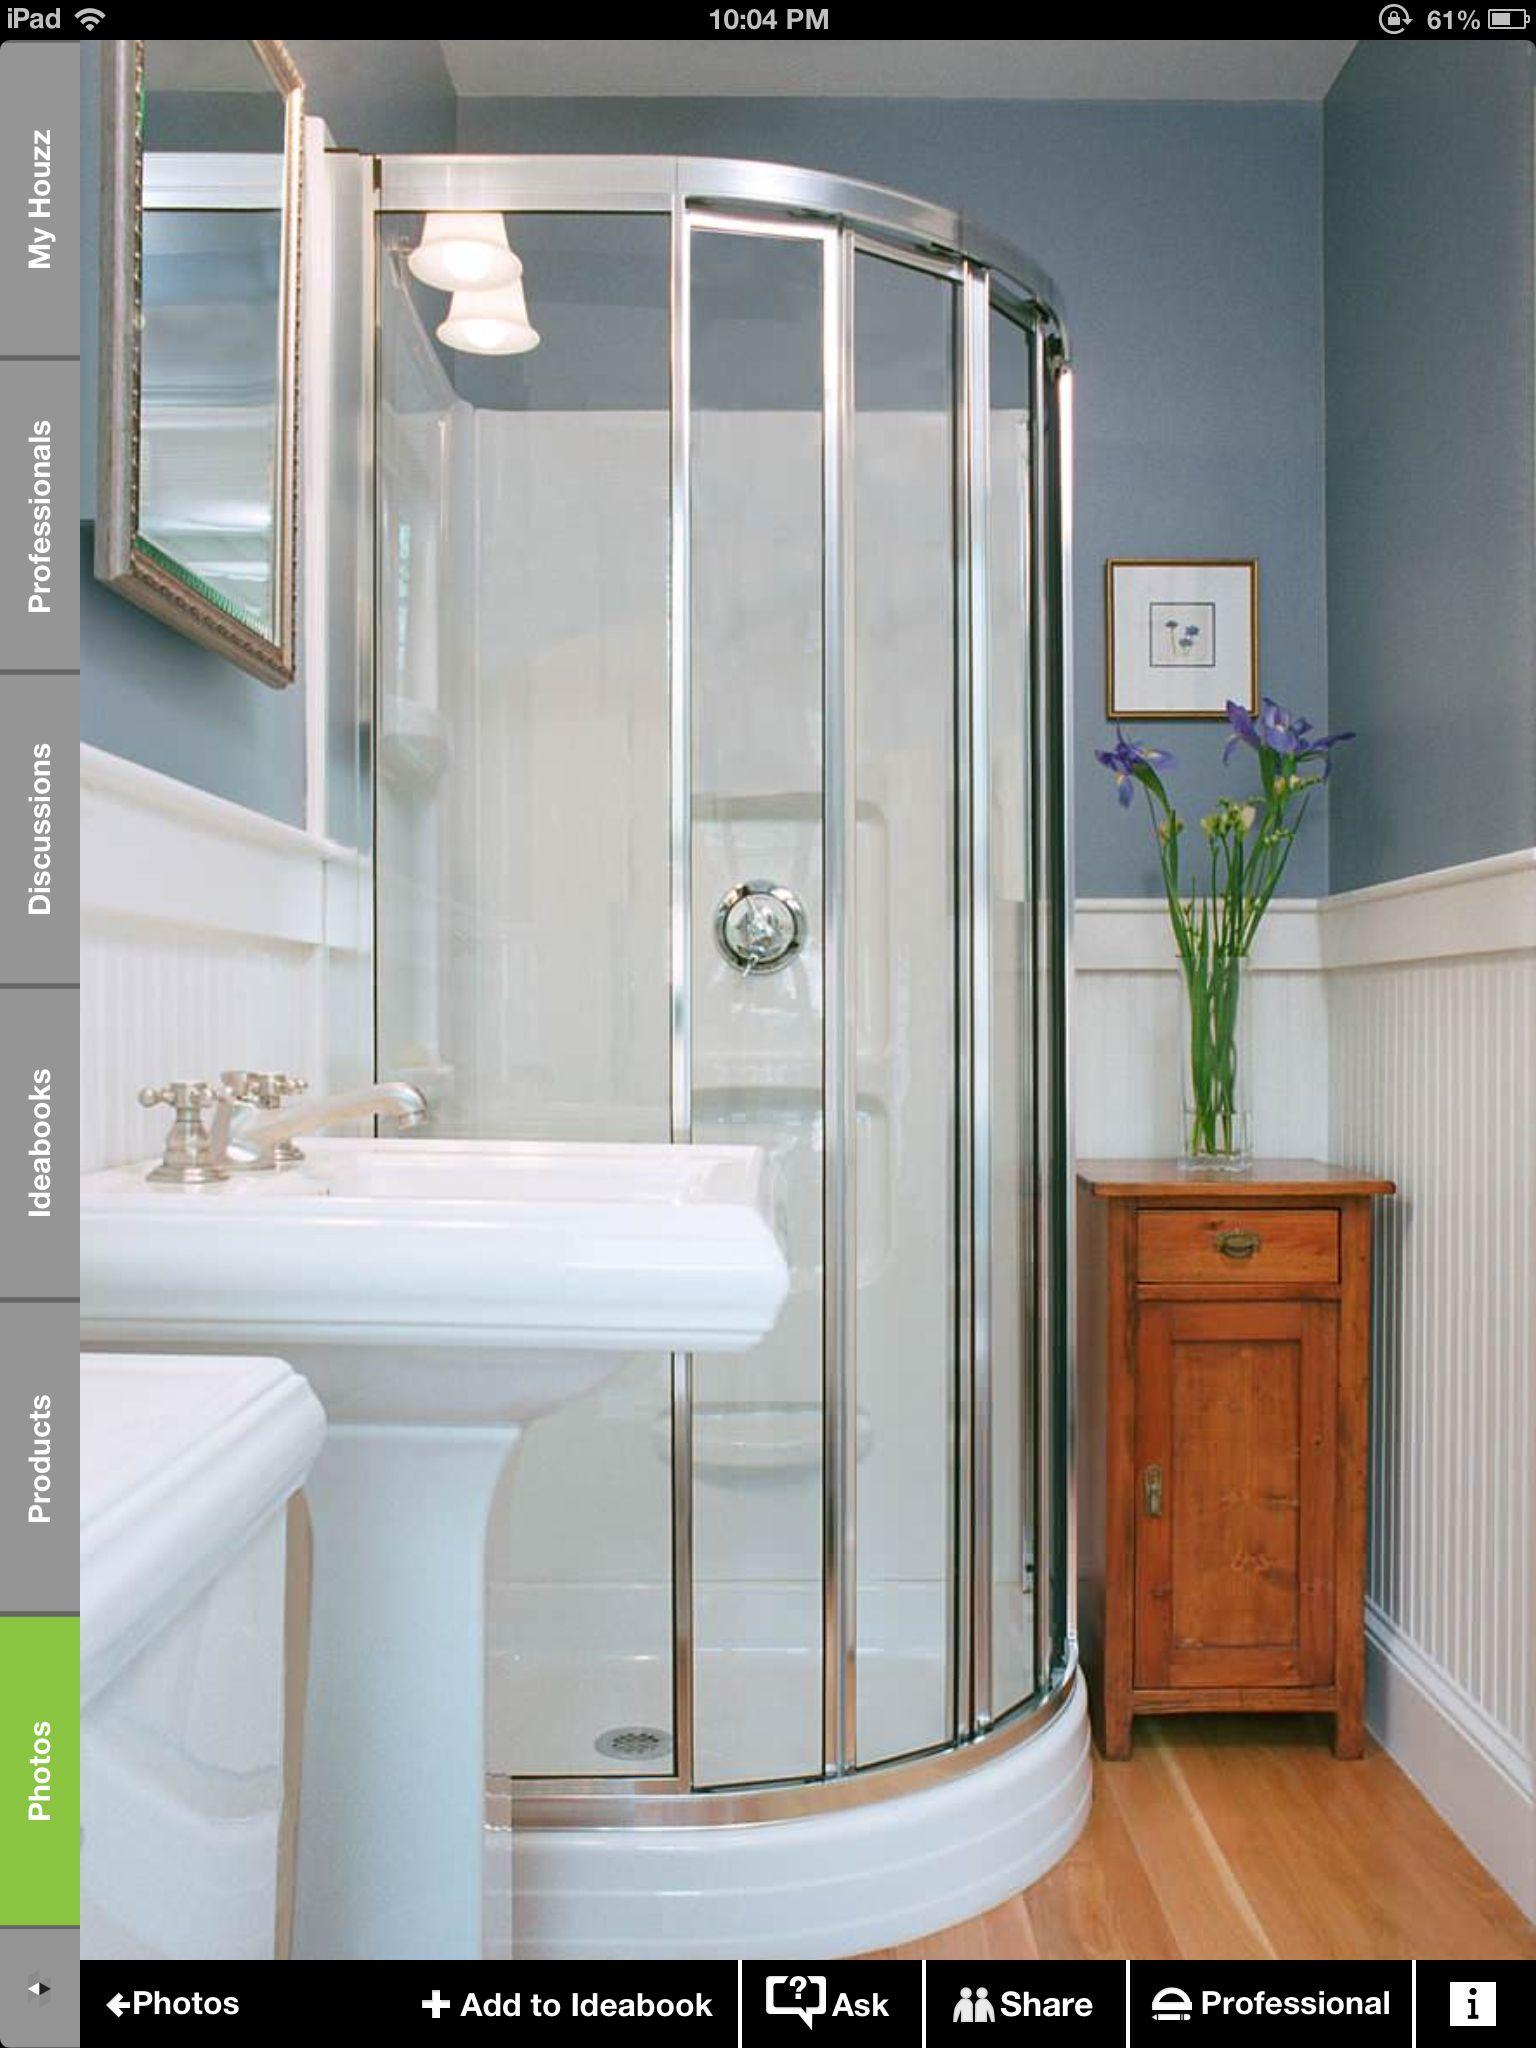 Over Garage loft small bathroom | Traditional bathroom ...